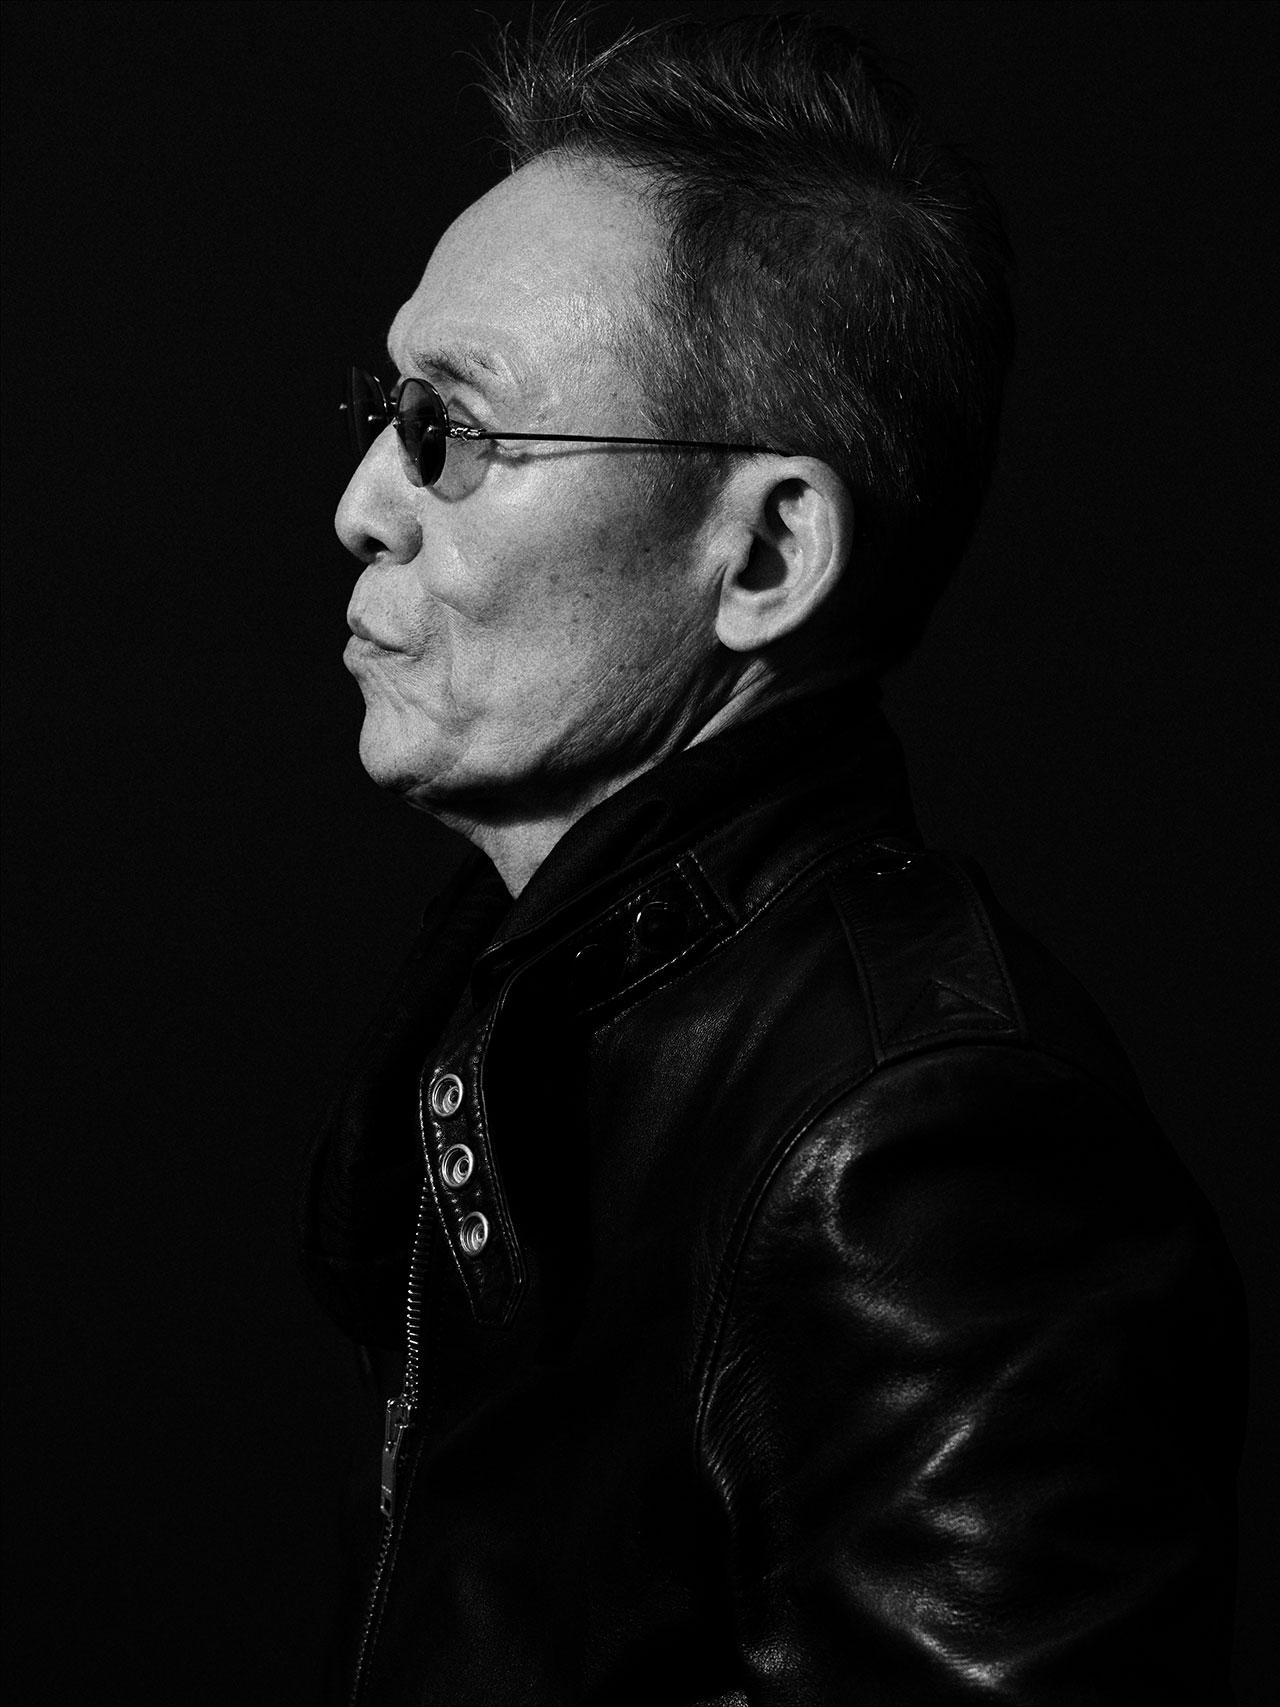 Photography: Hiroki Watanabe | © The Fashion Post